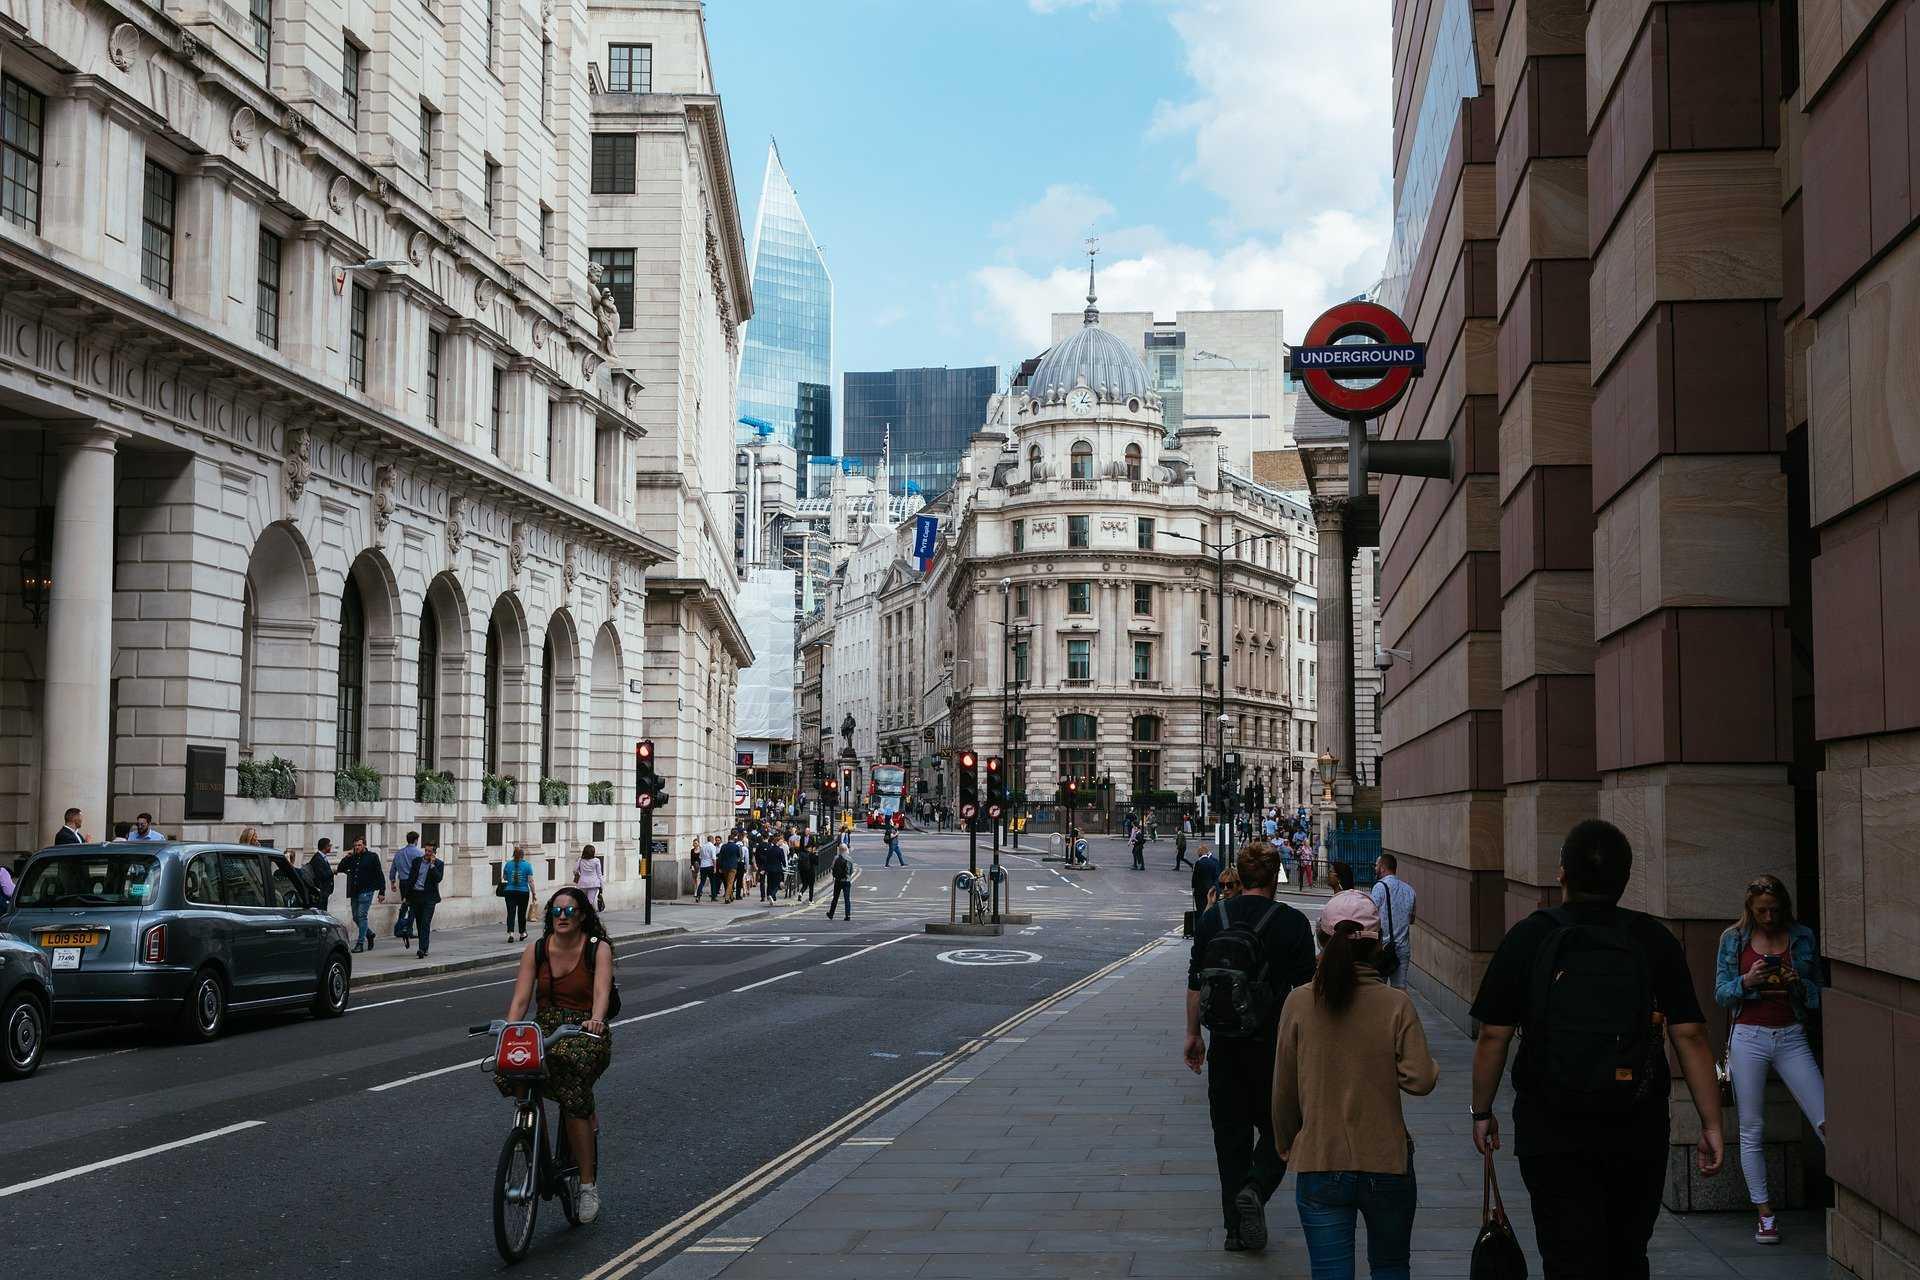 city-of-london-4481399_1920 (1)